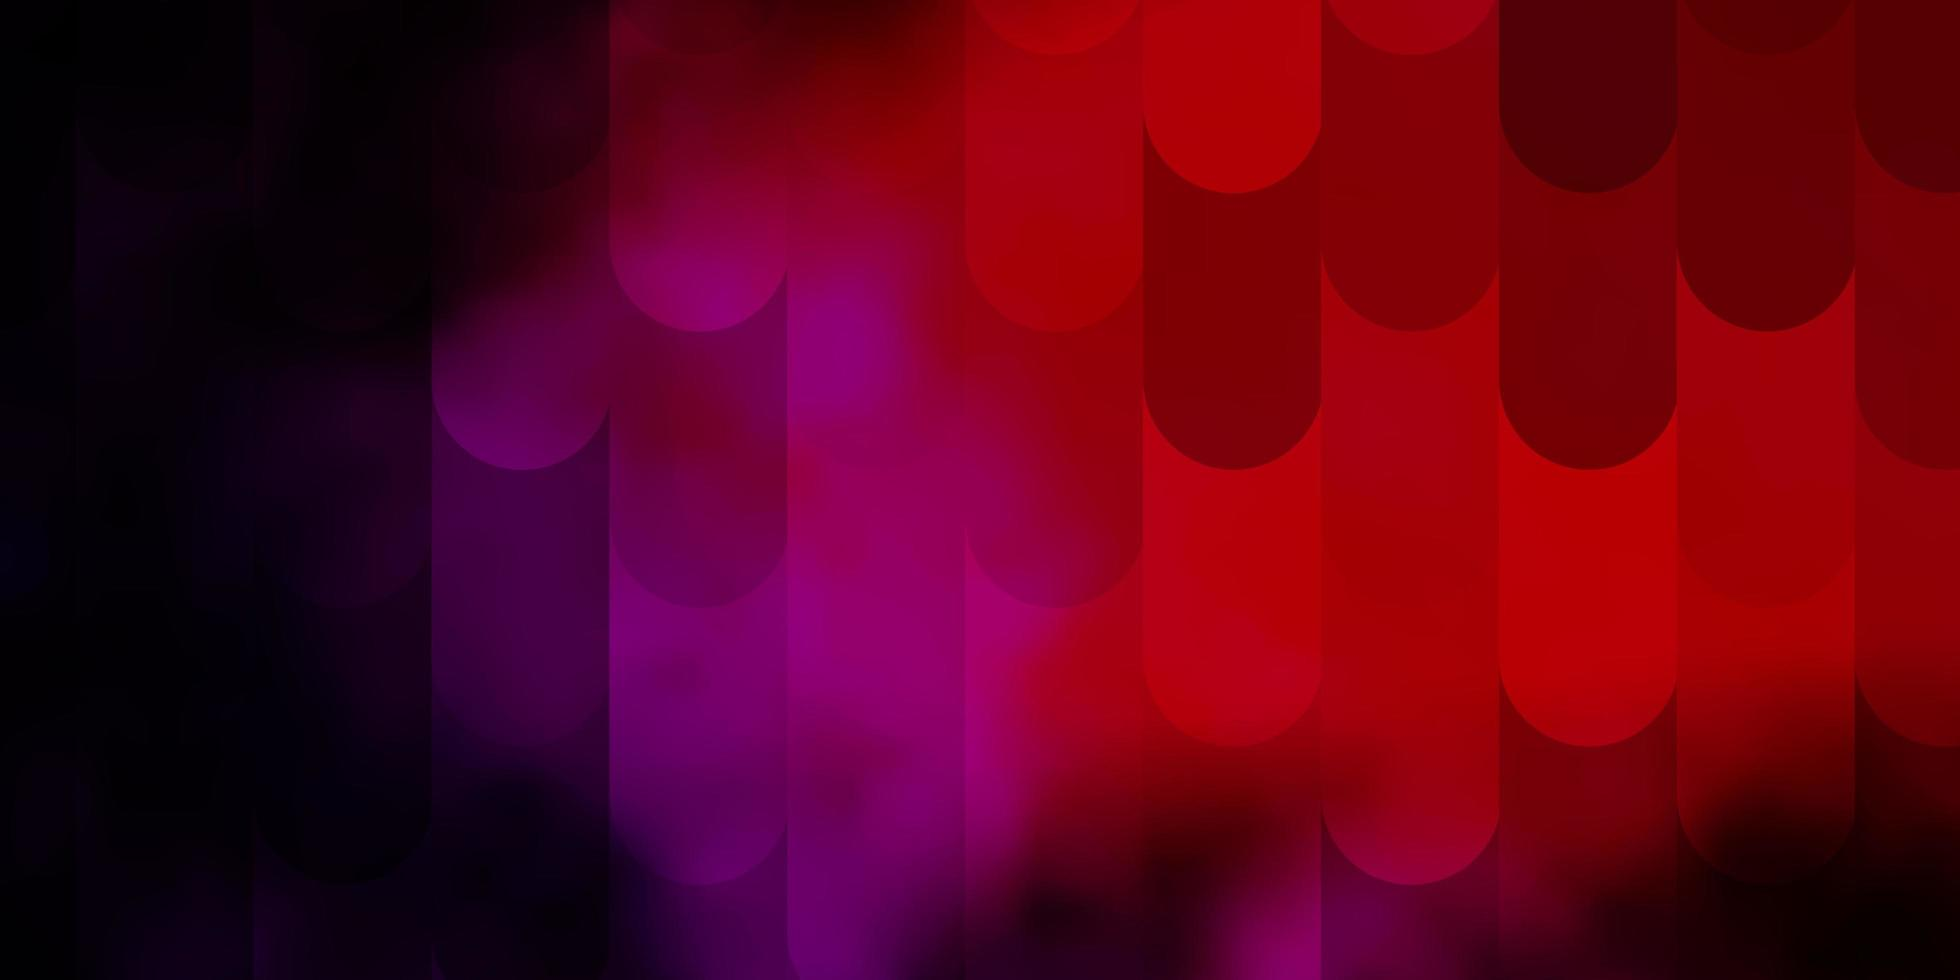 dunkelrosa, rotes Vektorlayout mit Linien. vektor